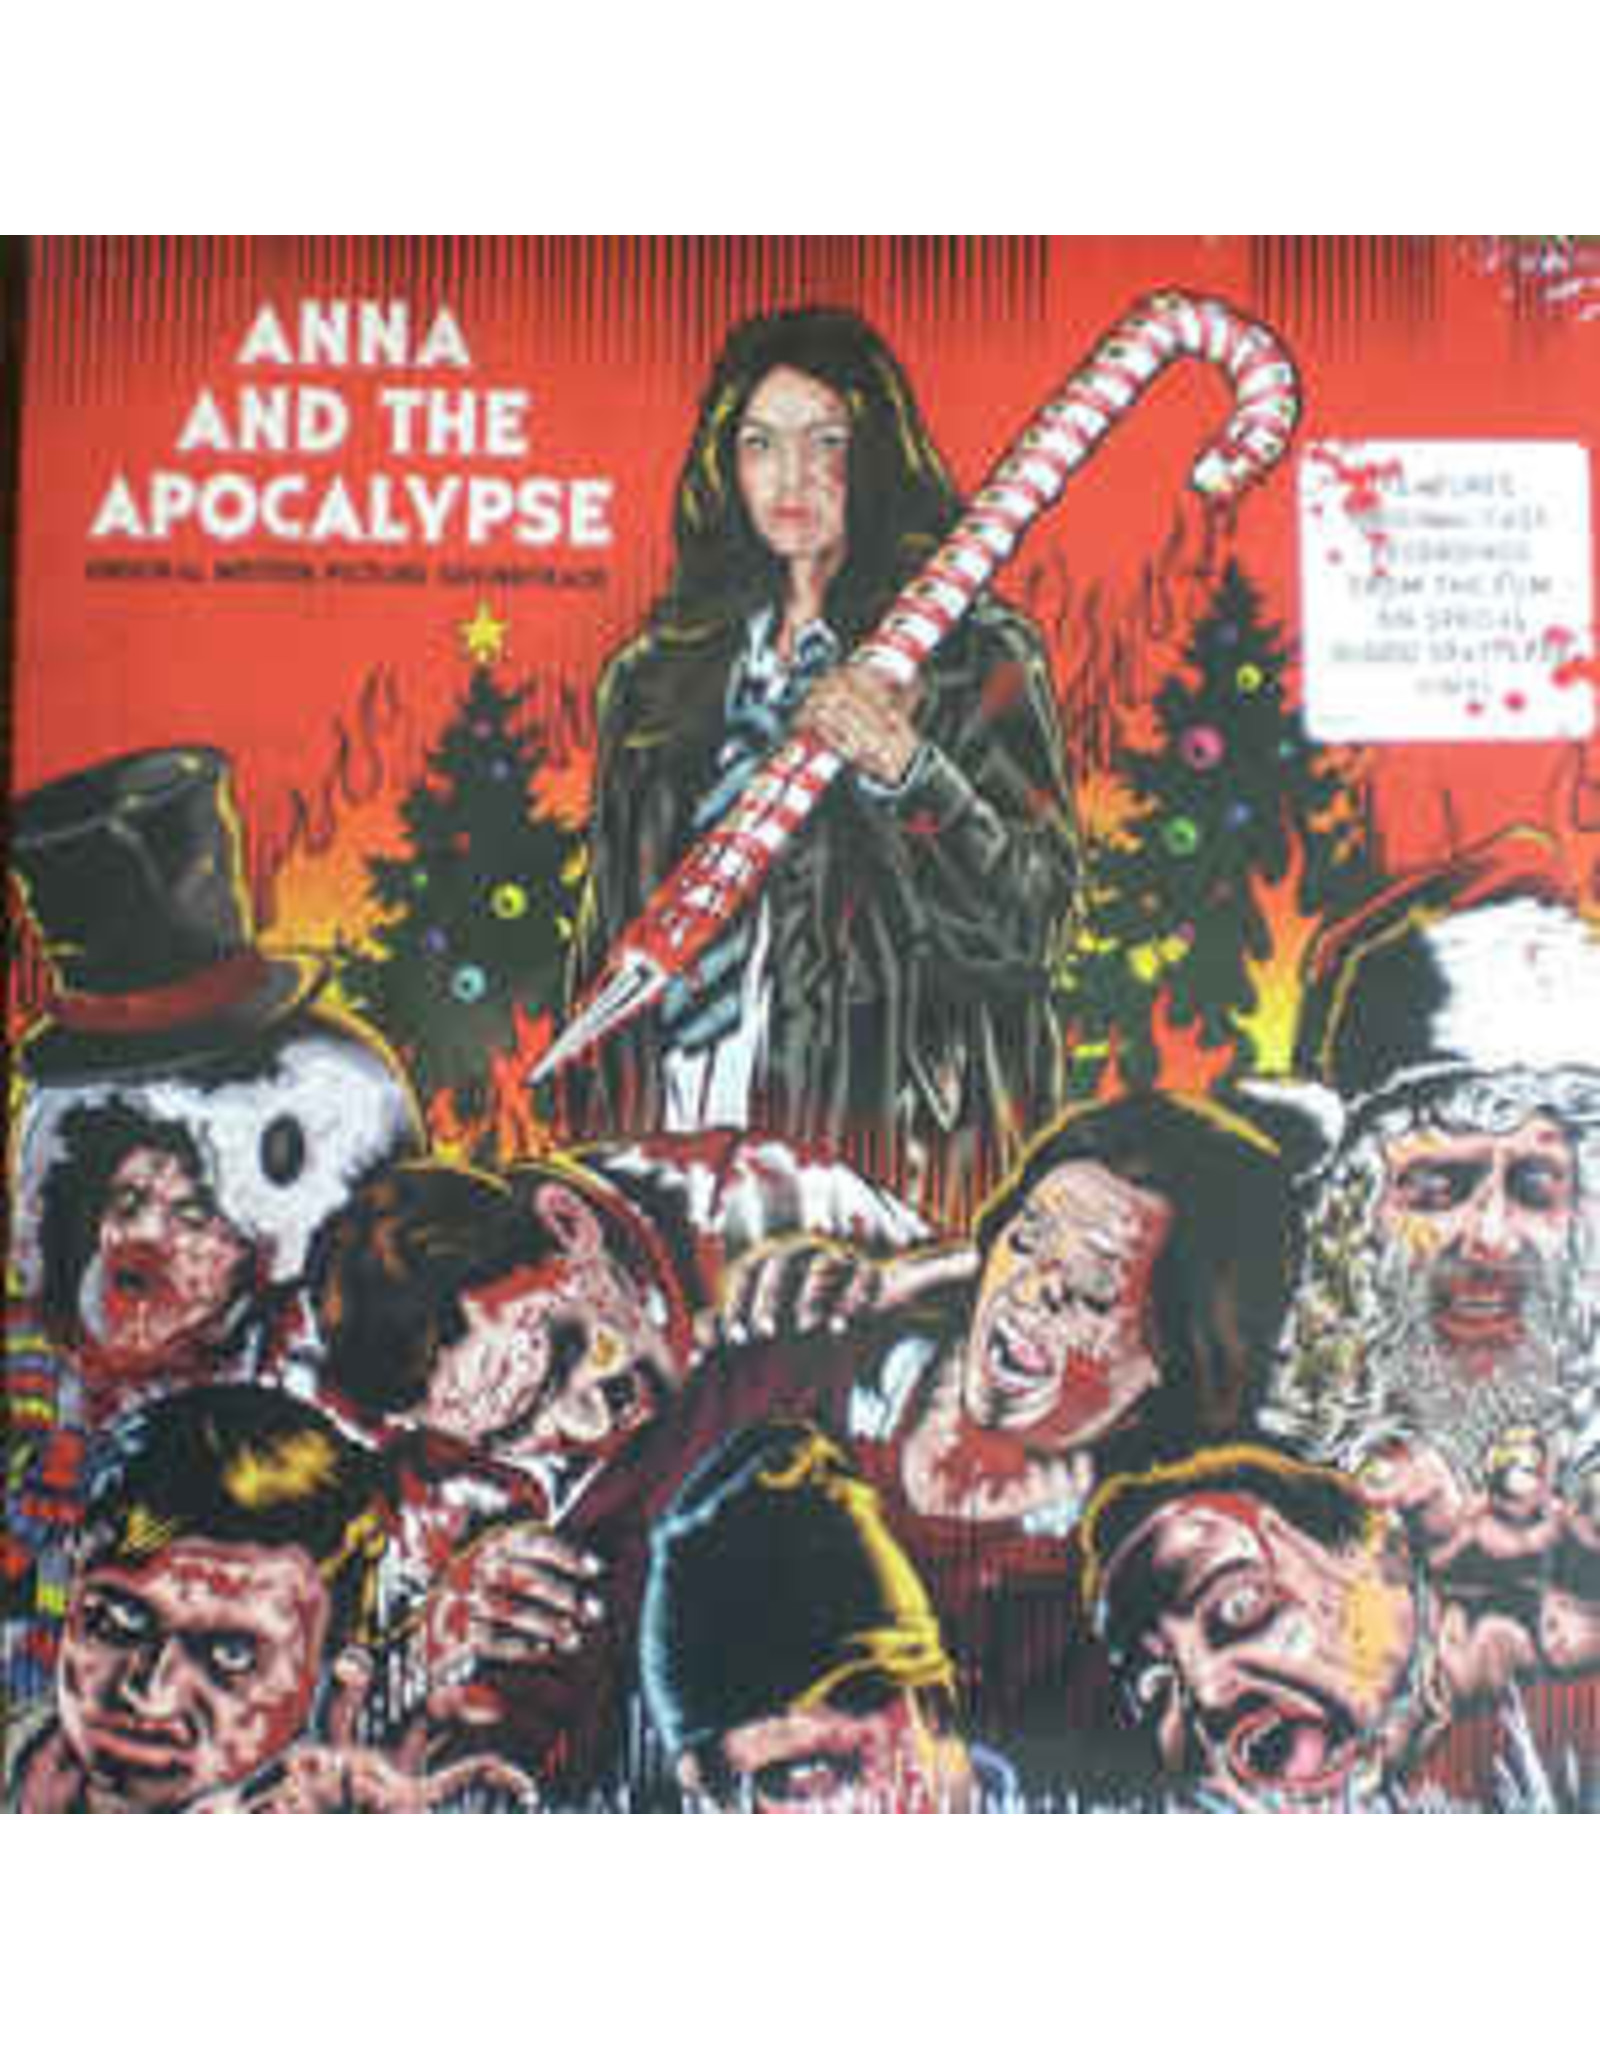 OST - Anna and the Apocalypse LP